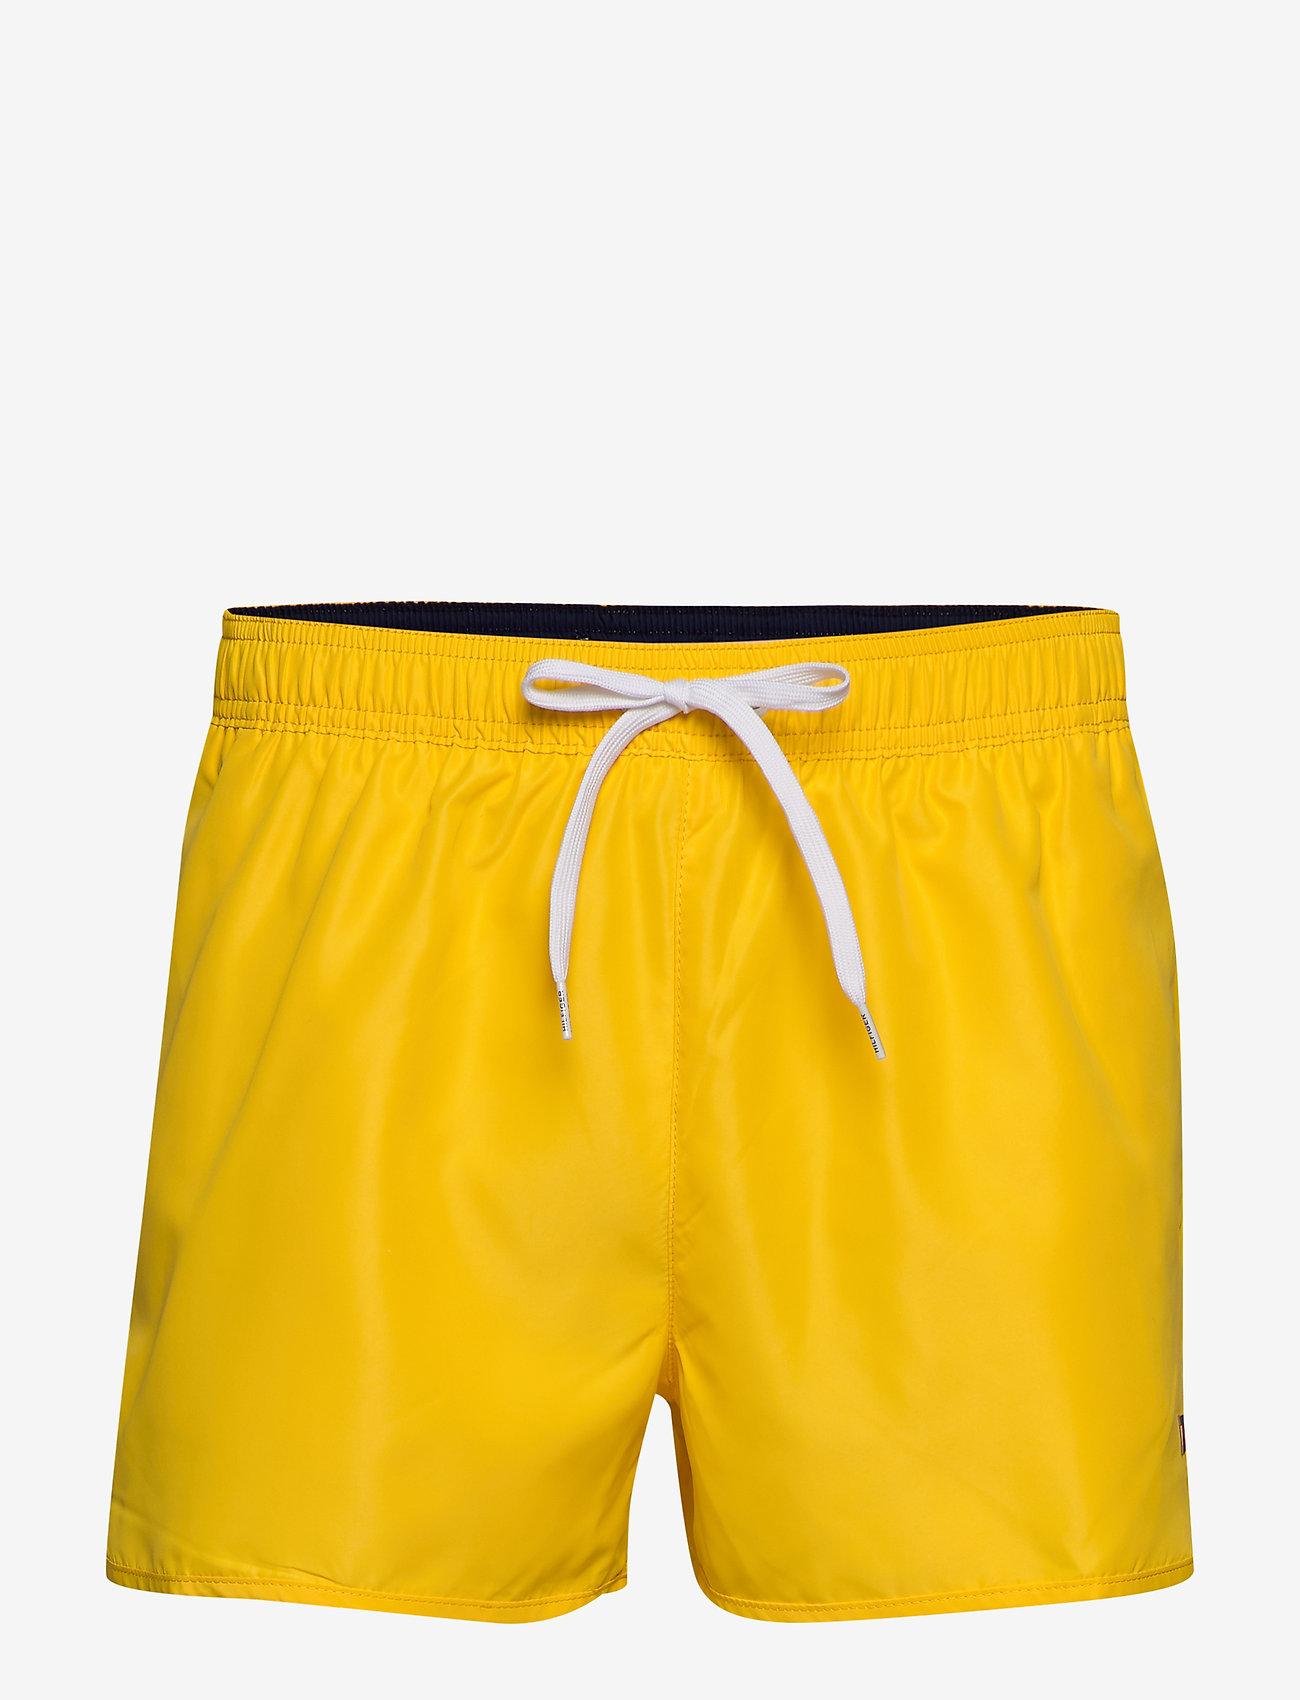 Tommy Hilfiger - RUNNER - swim shorts - bold yellow - 0